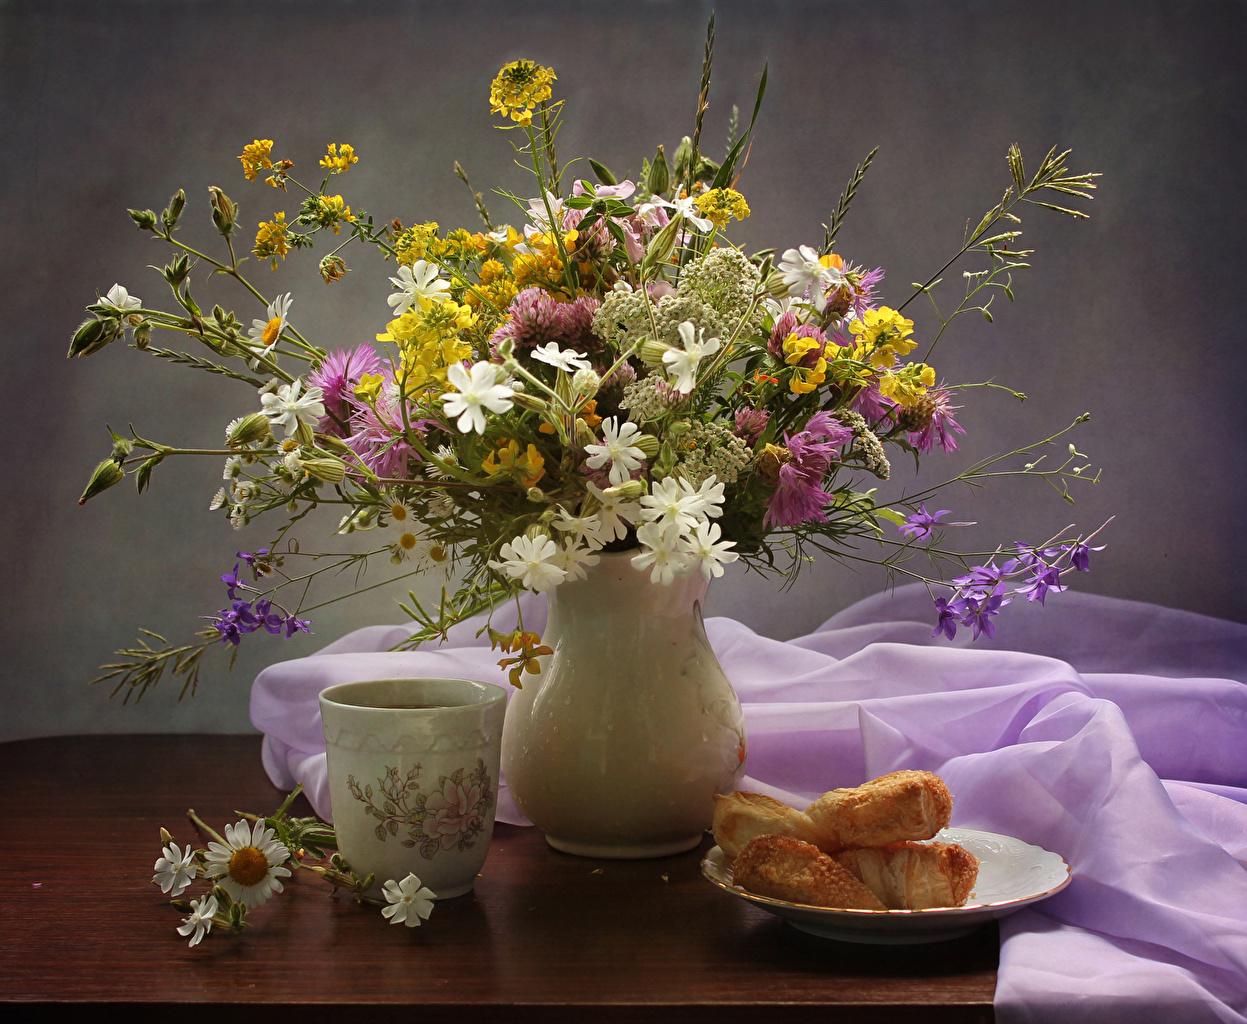 Wallpaper Bouquets Flowers matricaria Cup Vase Food Plate Handbell Cornflowers Still-life Little cakes bouquet flower Camomiles Bells Centaurea